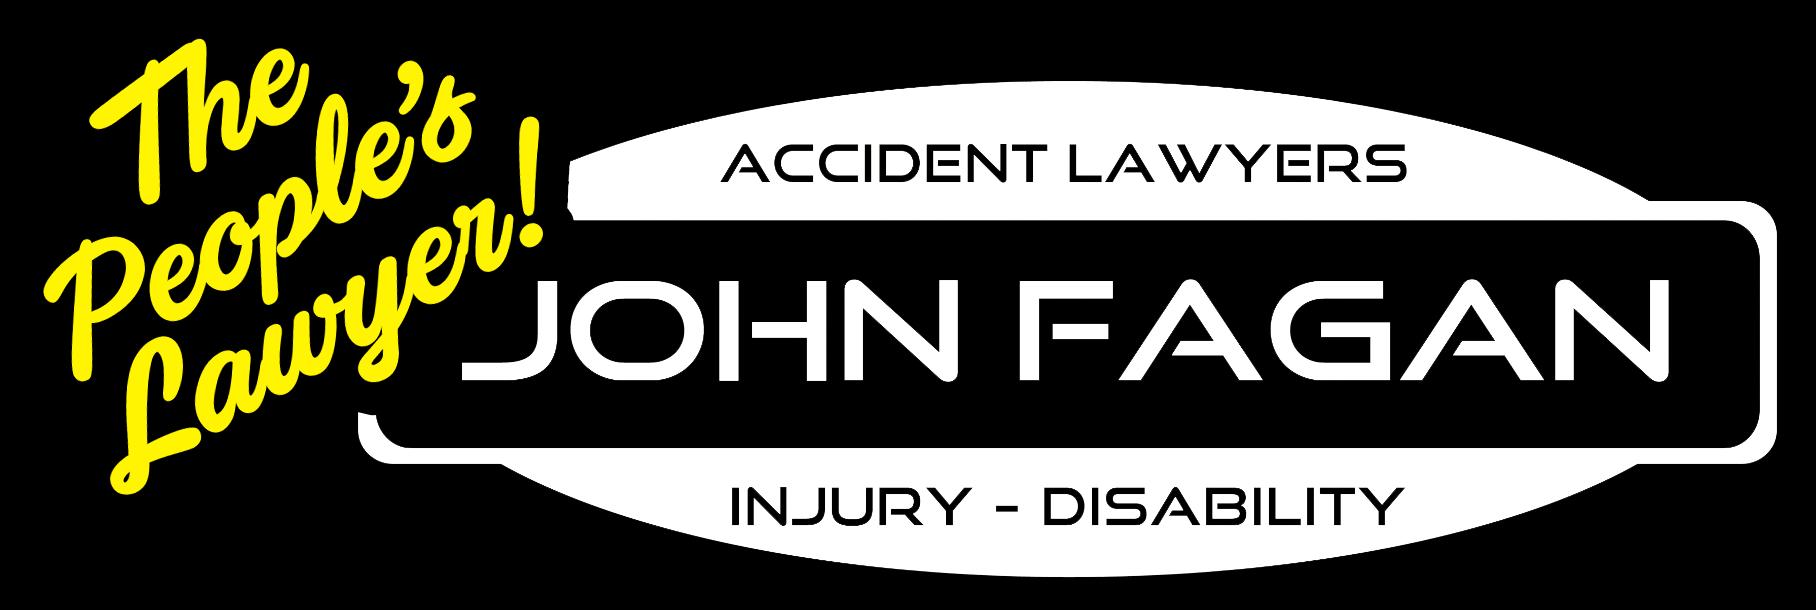 <b>Accident Lawyer John Fagan</b>